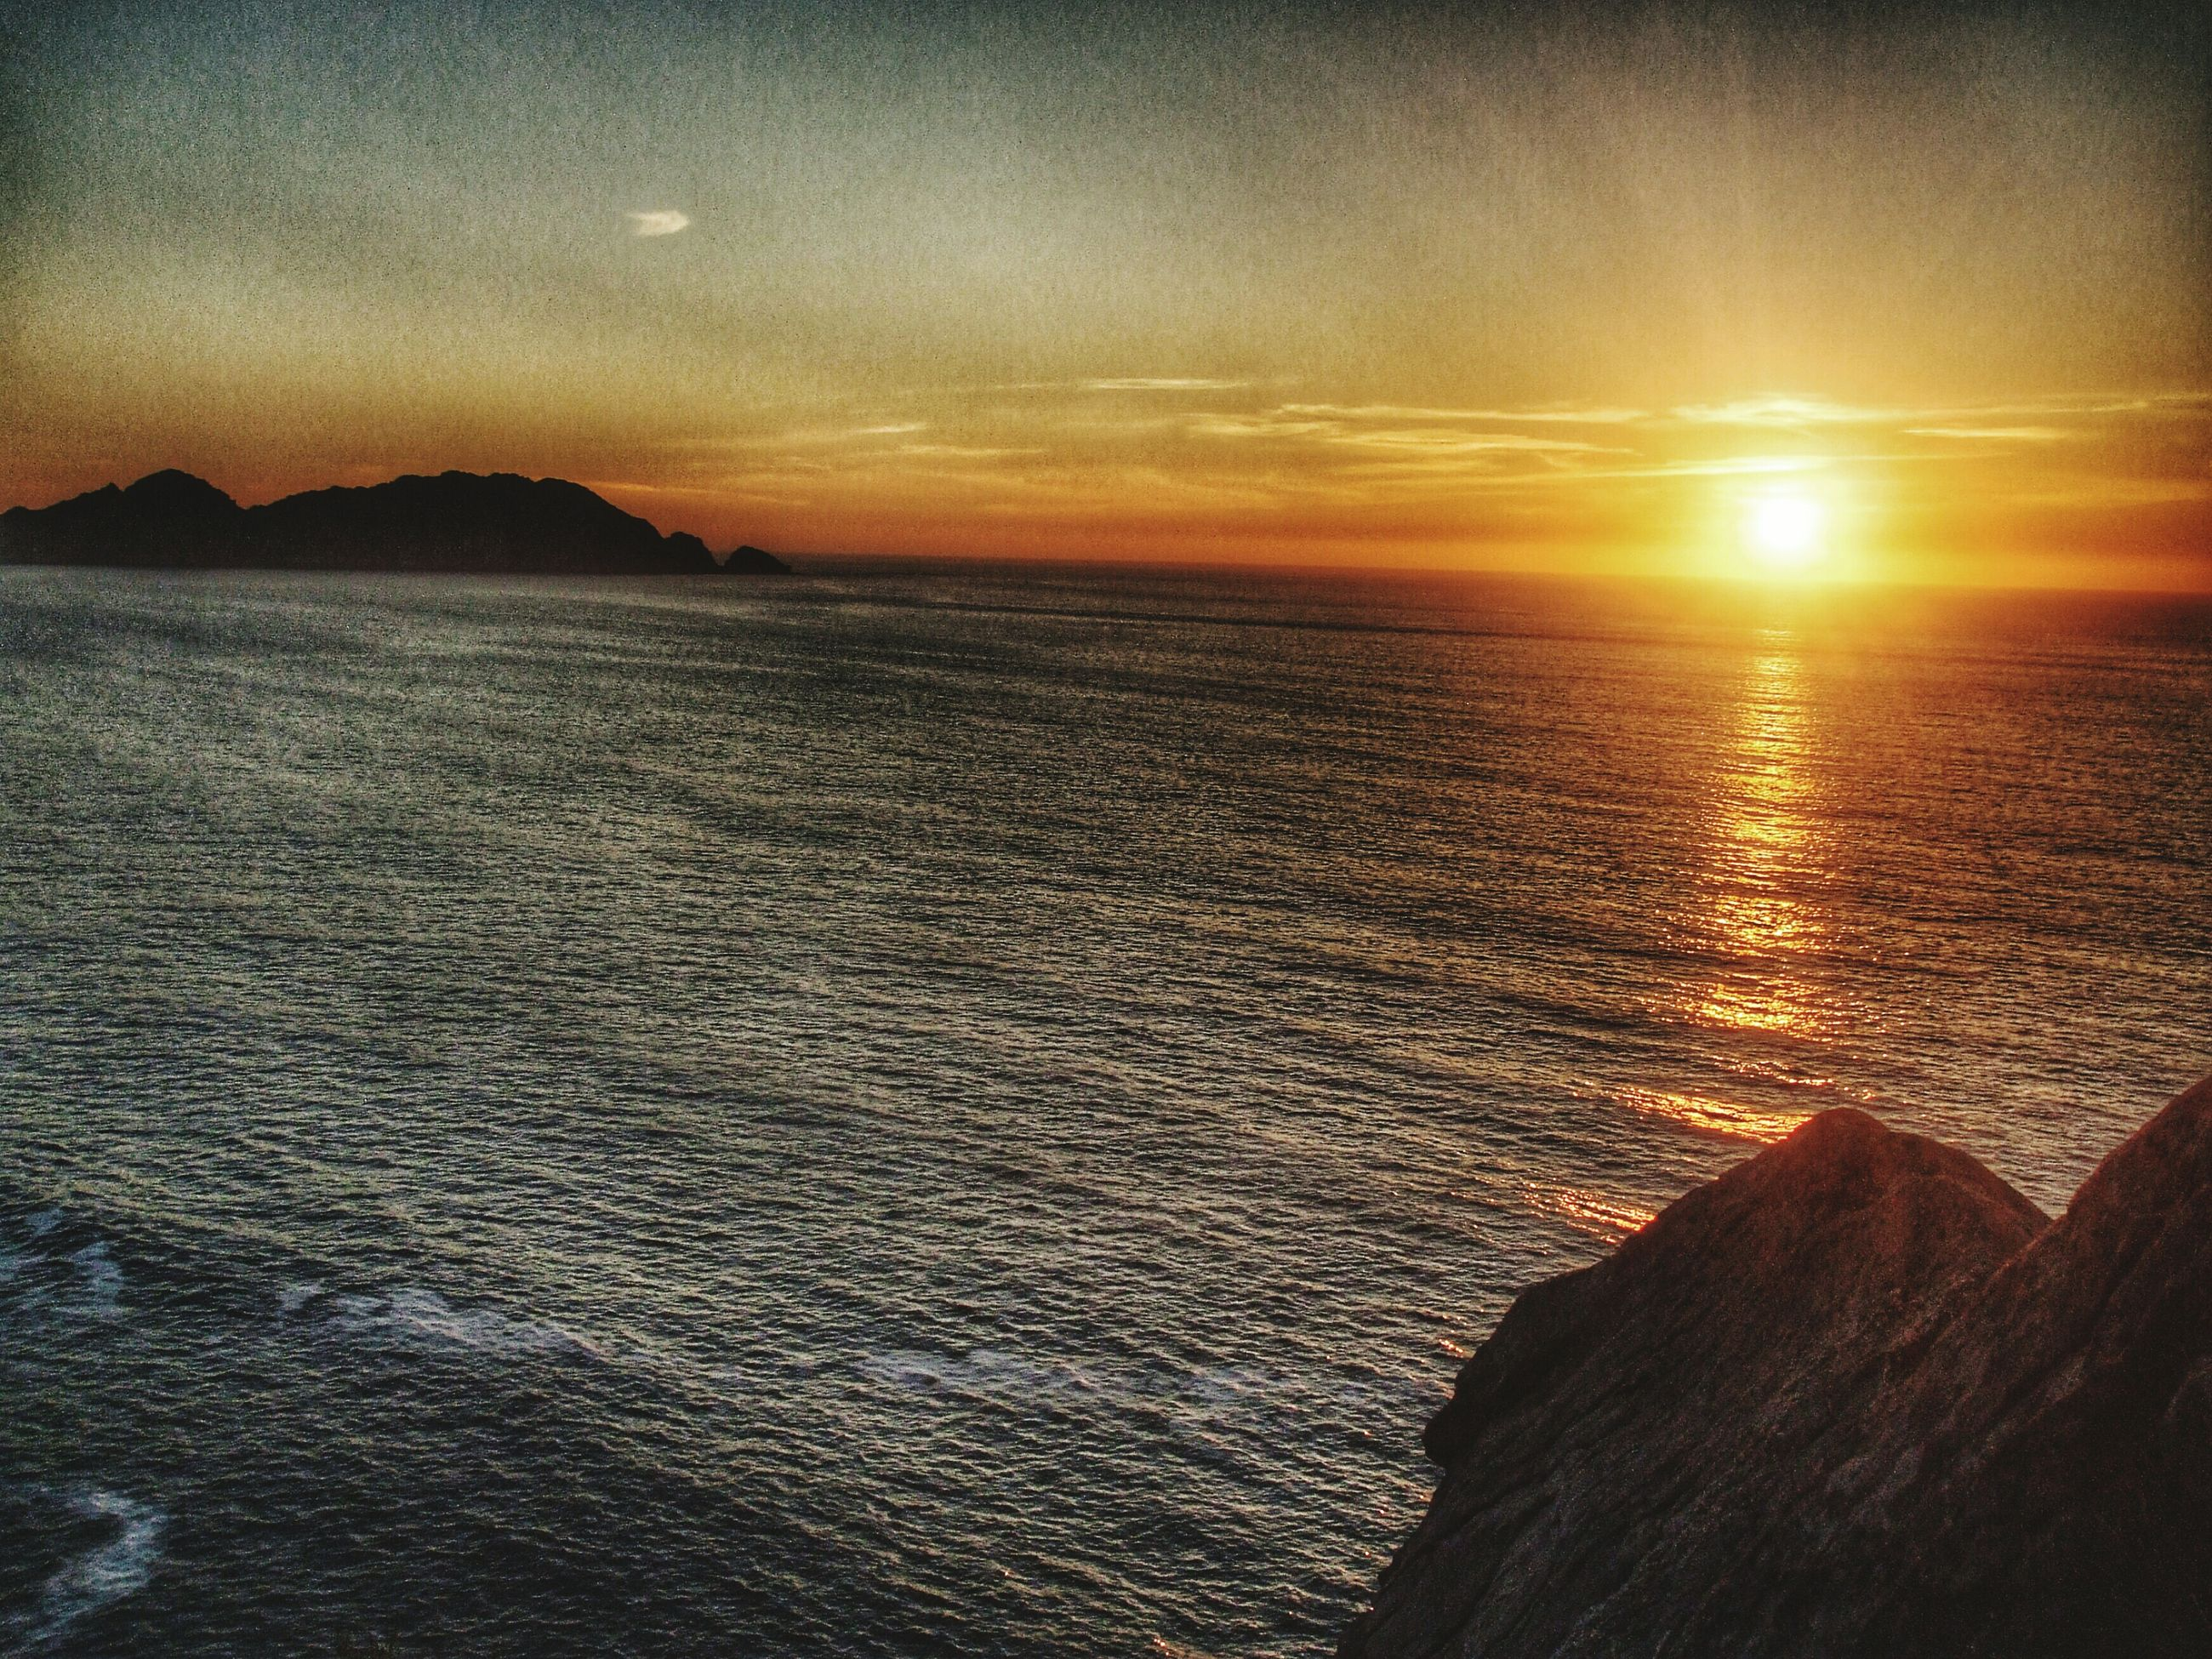 sunset, water, sea, scenics, sun, tranquil scene, beauty in nature, tranquility, horizon over water, sky, orange color, beach, idyllic, nature, reflection, silhouette, sunlight, shore, rippled, non-urban scene